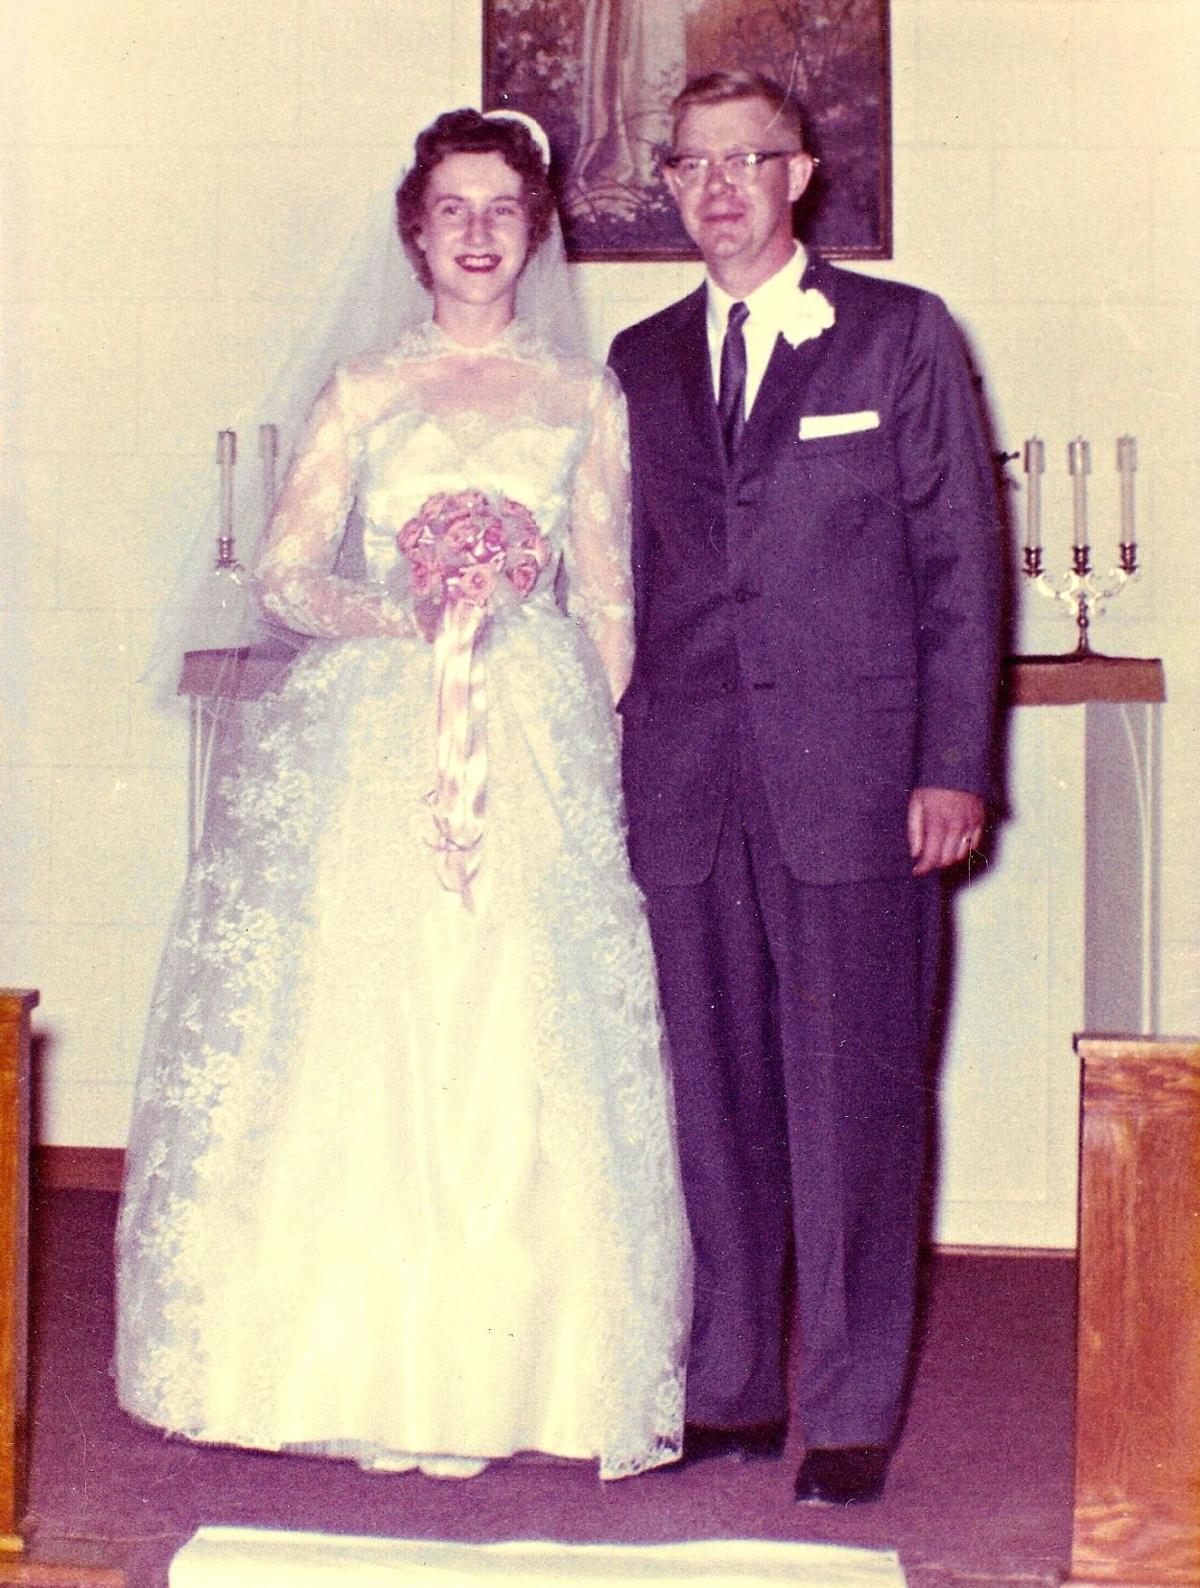 Marlen and Lorraine Anderson on their wedding day in 1961